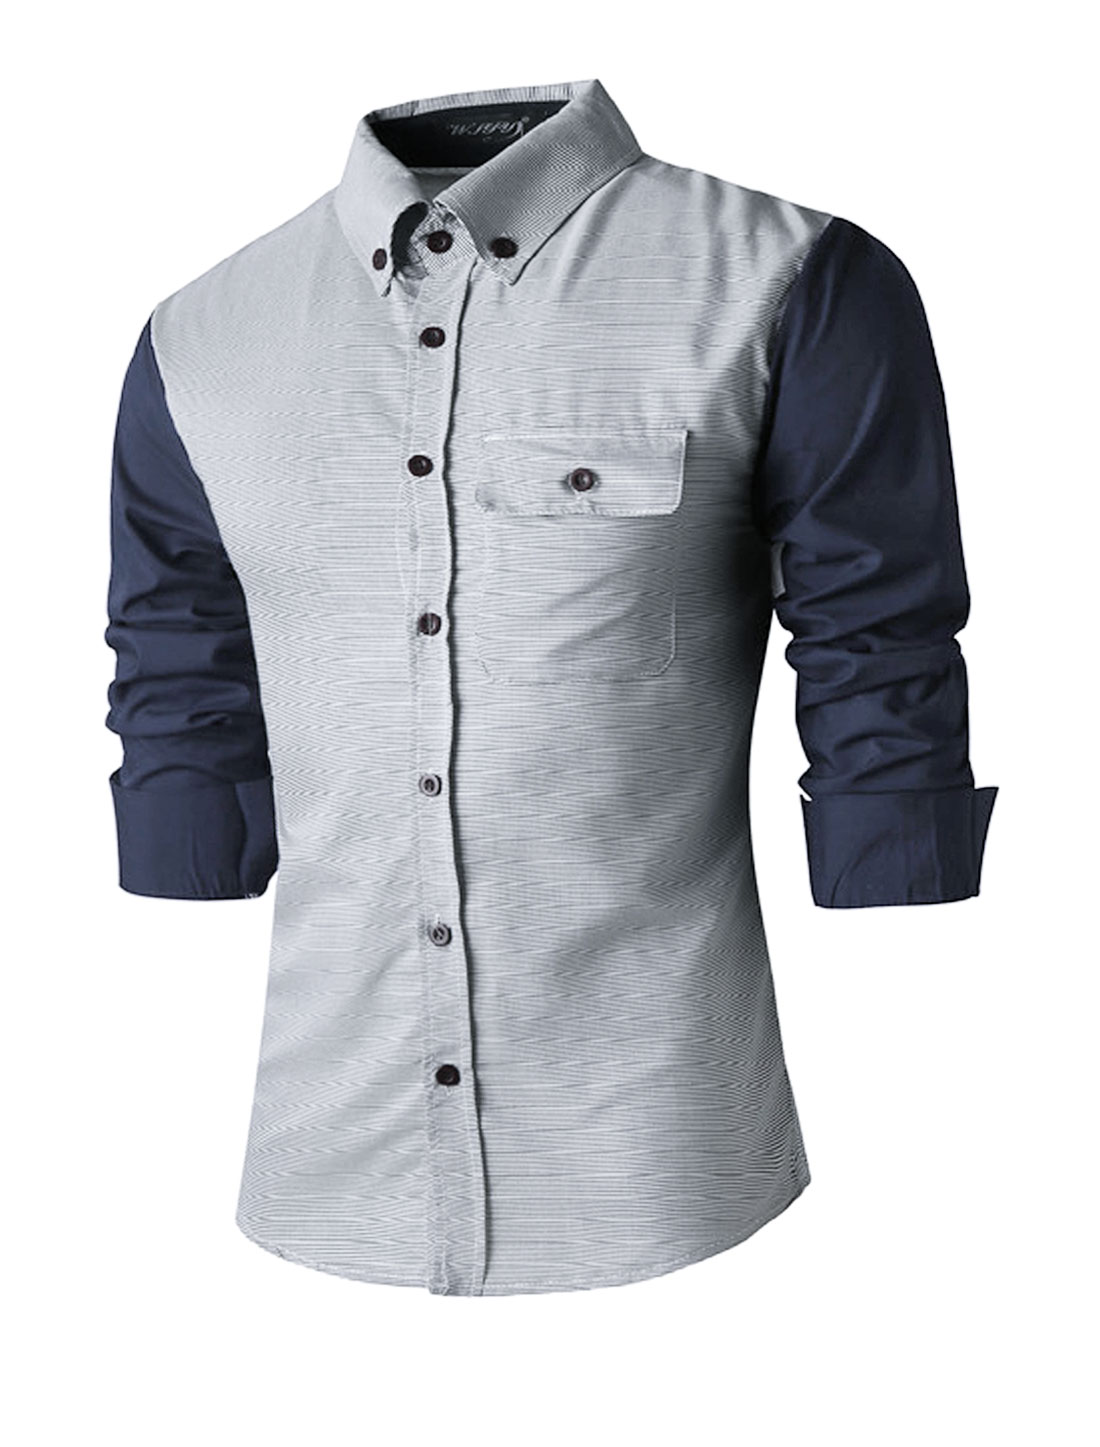 Men Stripes Contrast Color Long Sleeves Button Down Shirt Blue S